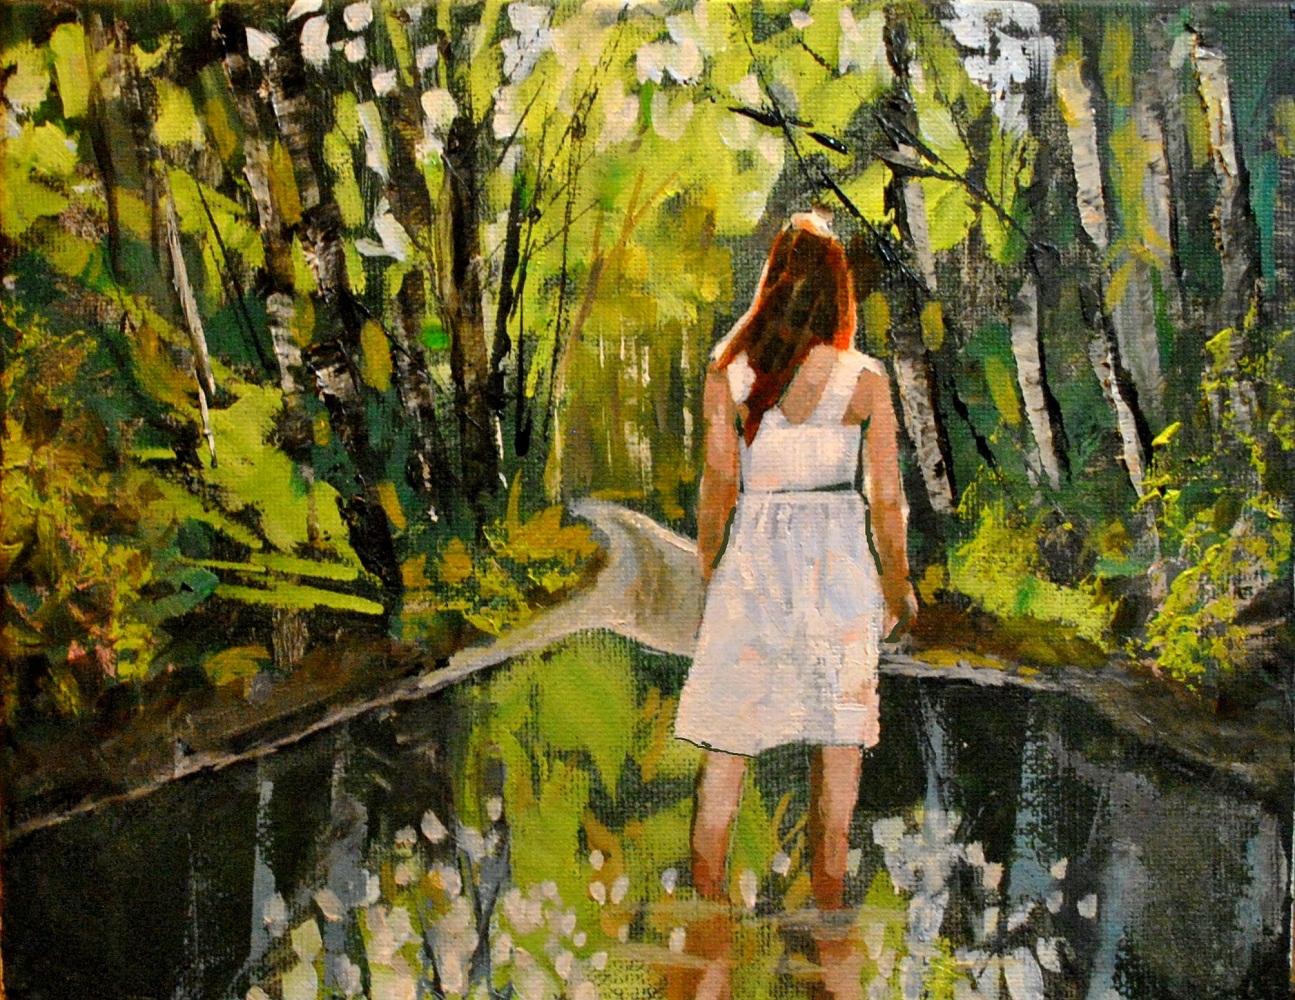 """Fresh Forrest 8x10 oil on canvas in darkwood frame"" original fine art by David Larson Evans"